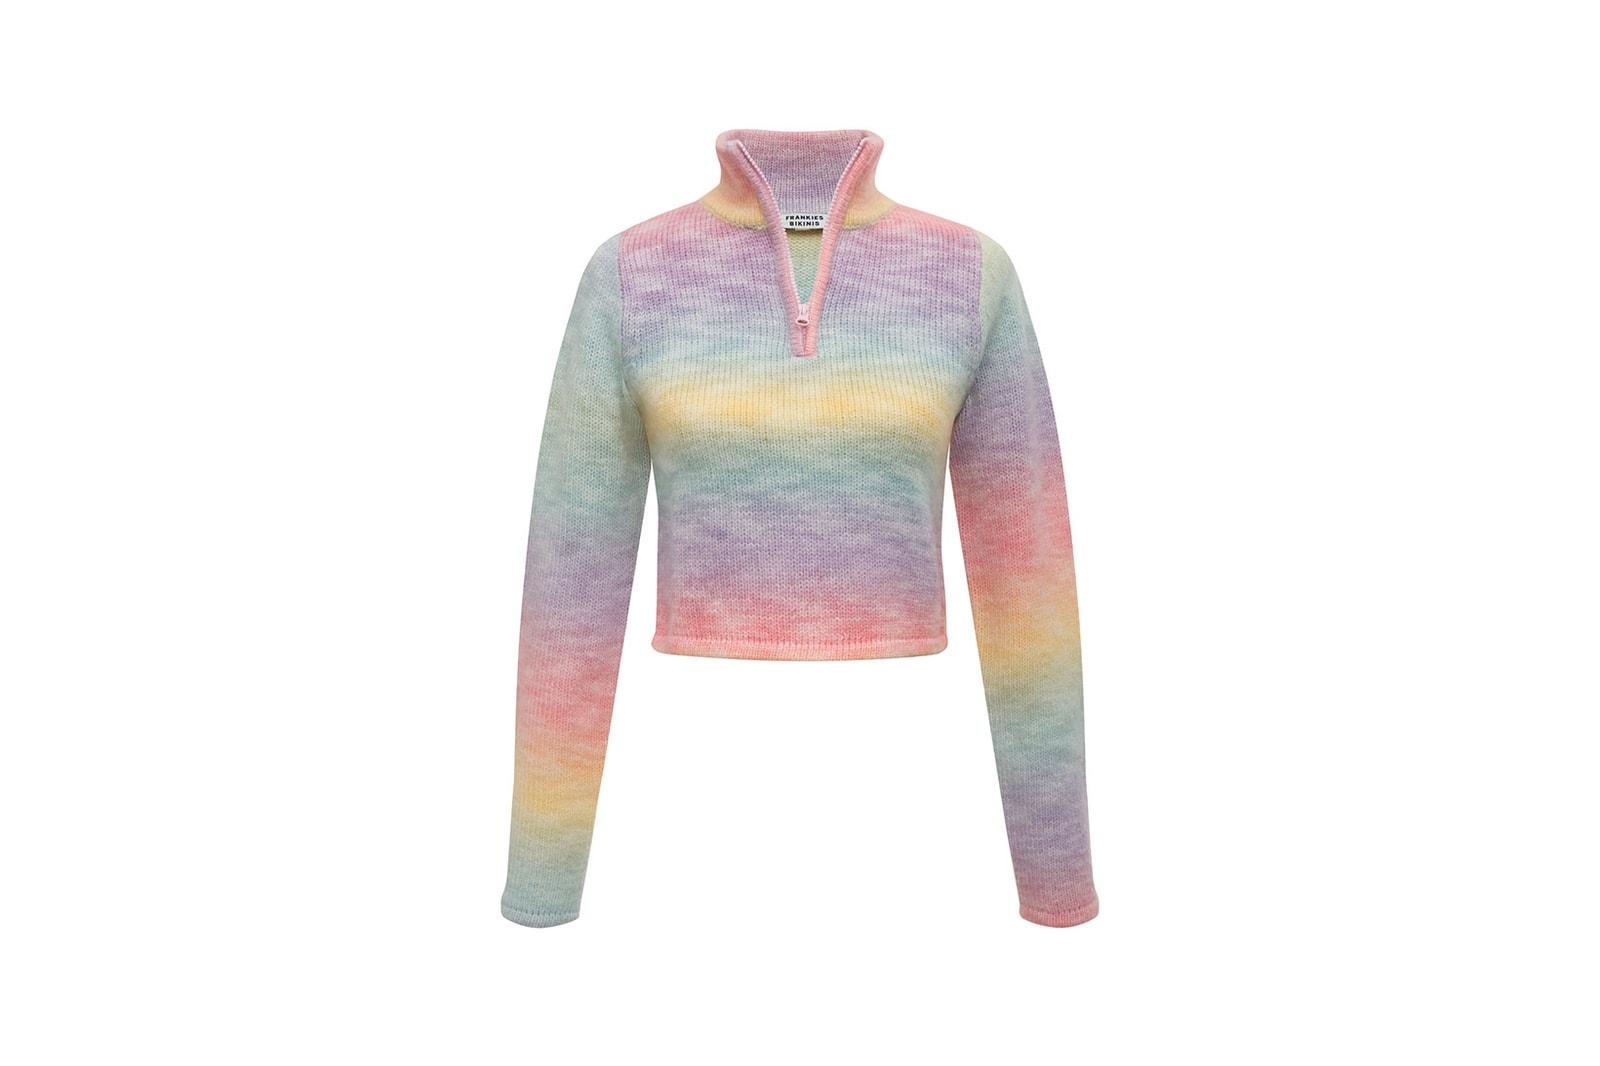 frankies bikinis knits loungewear collection hoodie halter dress pink blue white purple yellow